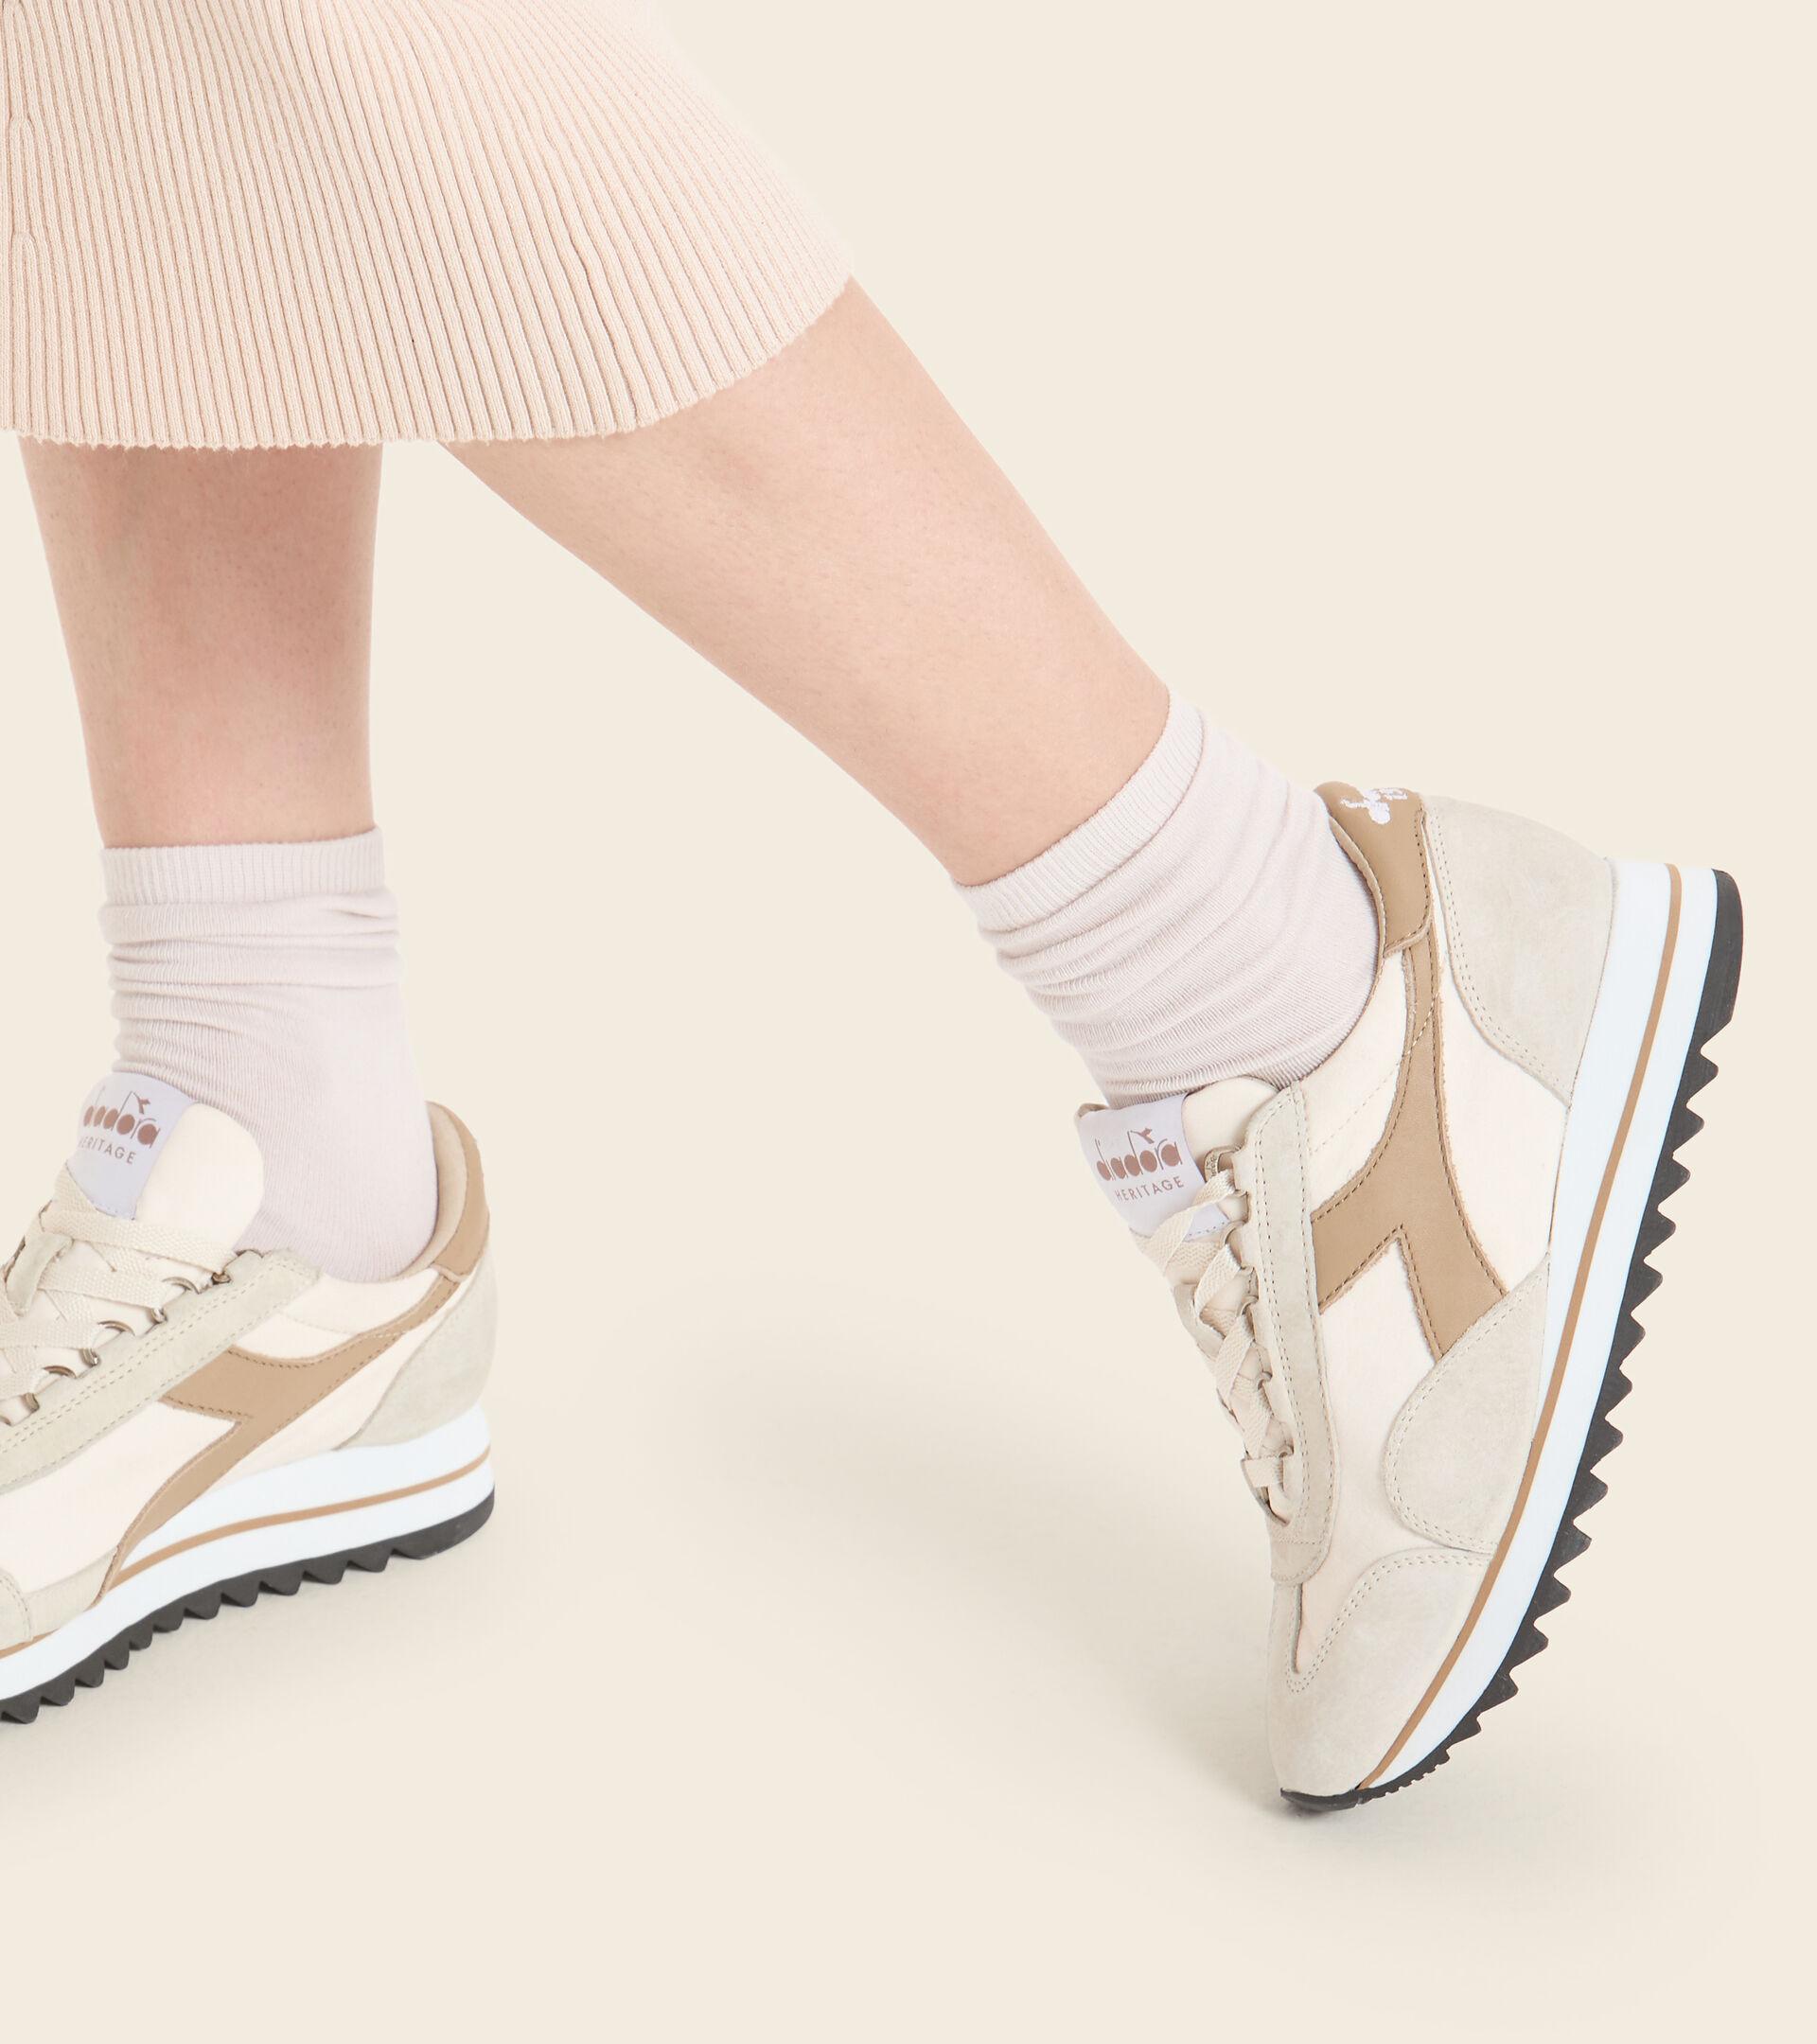 Heritage shoe - Women EQUIPE SUEDE SW EVO WN EGG WHITE - Diadora